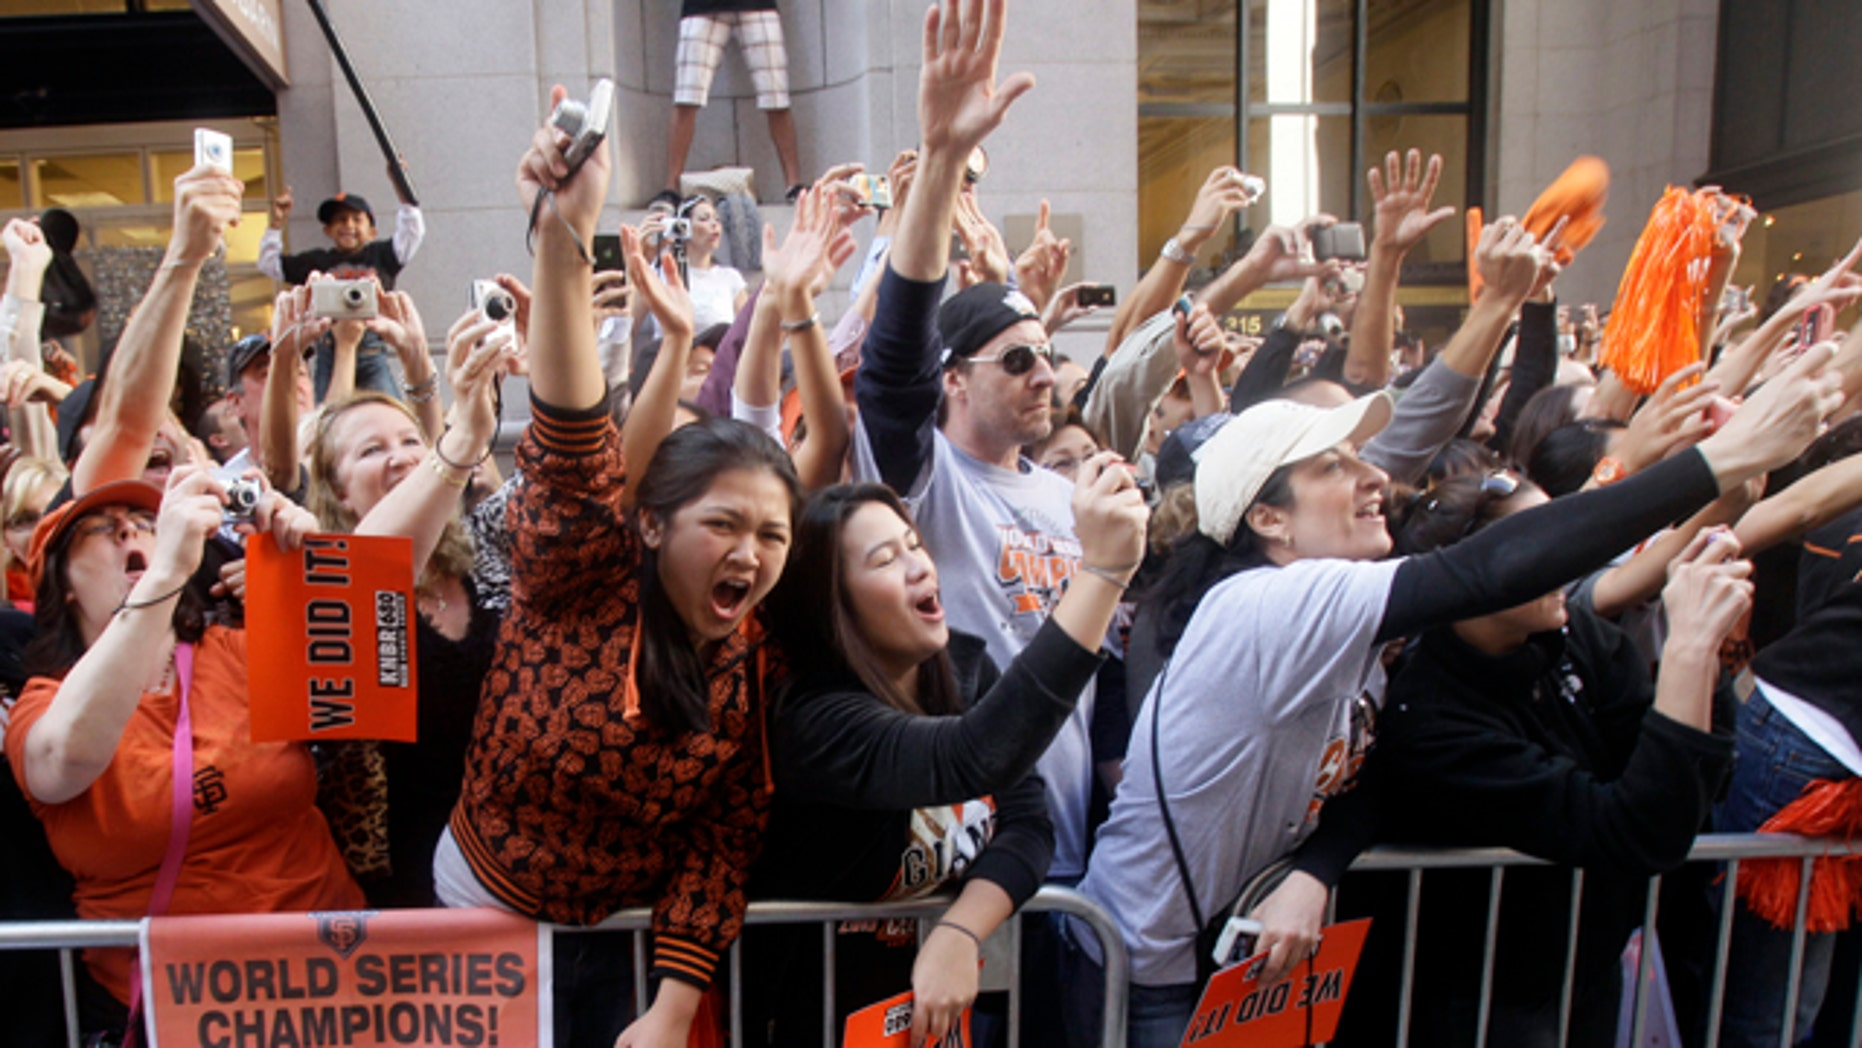 Nov. 3: San Francisco Giants fans celebrate during a baseball World Series parade in downtown San Francisco.